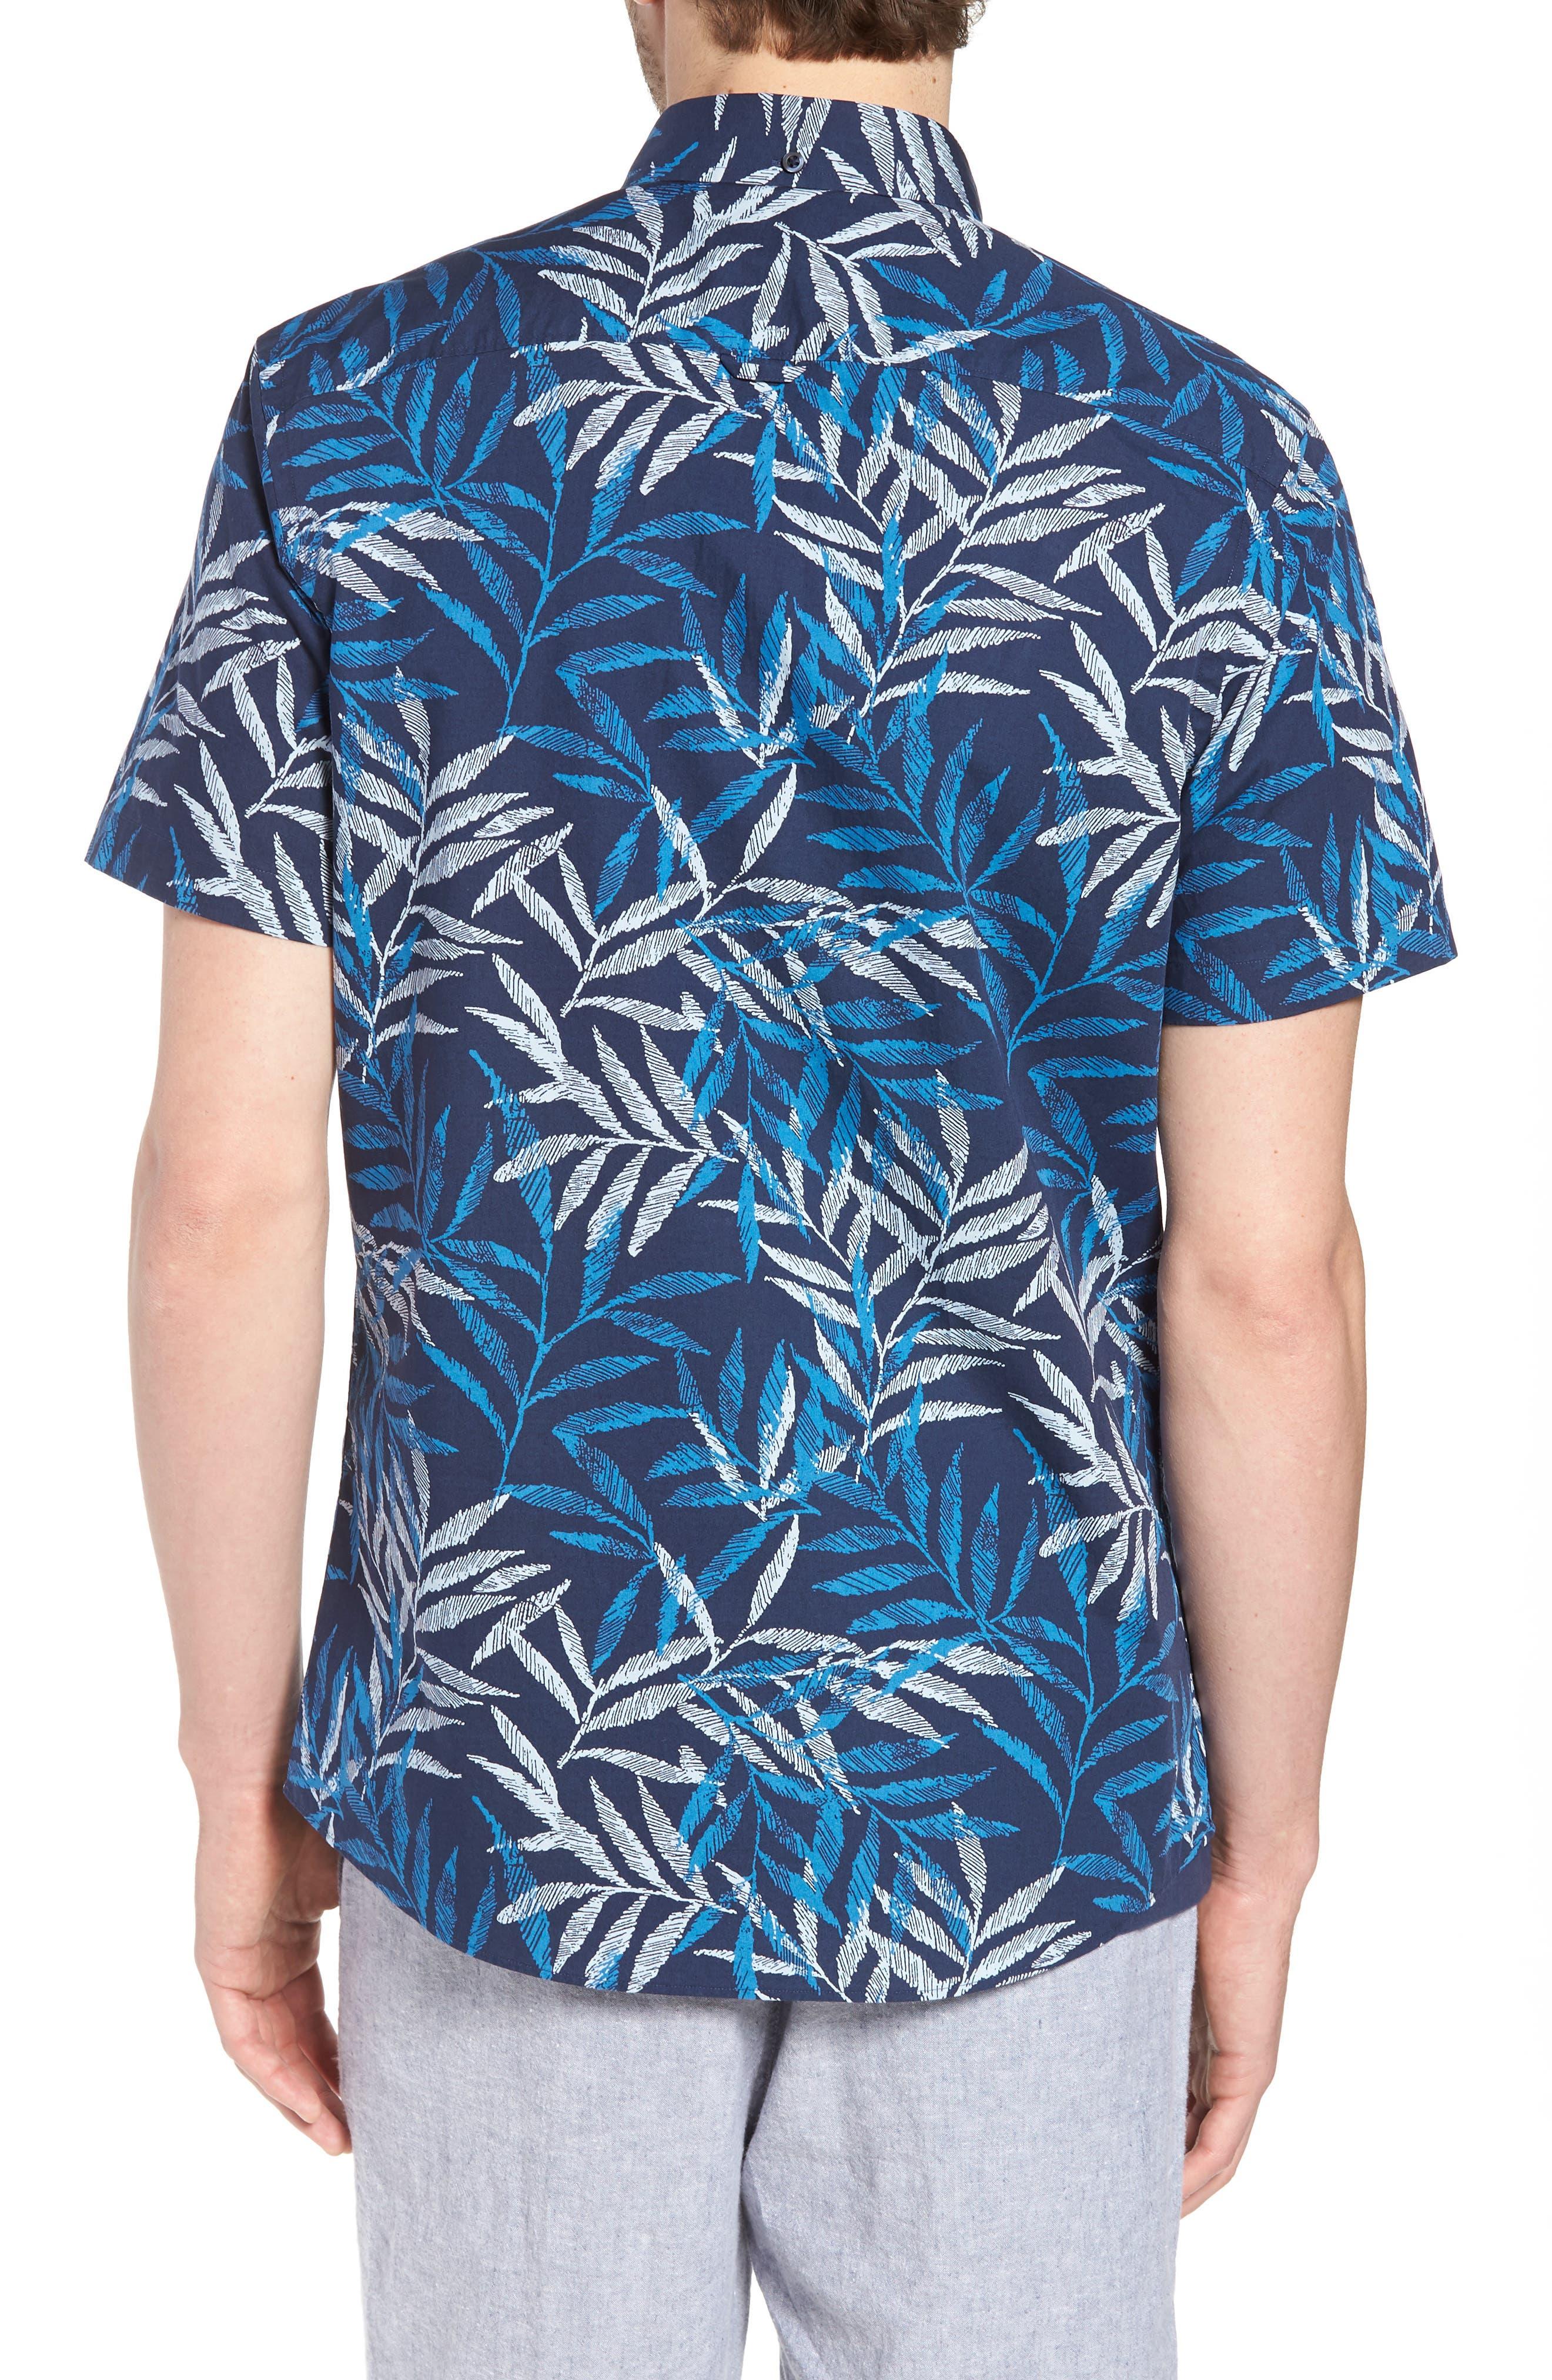 Trim Fit Print Short Sleeve Sport Shirt,                             Alternate thumbnail 2, color,                             Blue Dark Etched Leaves